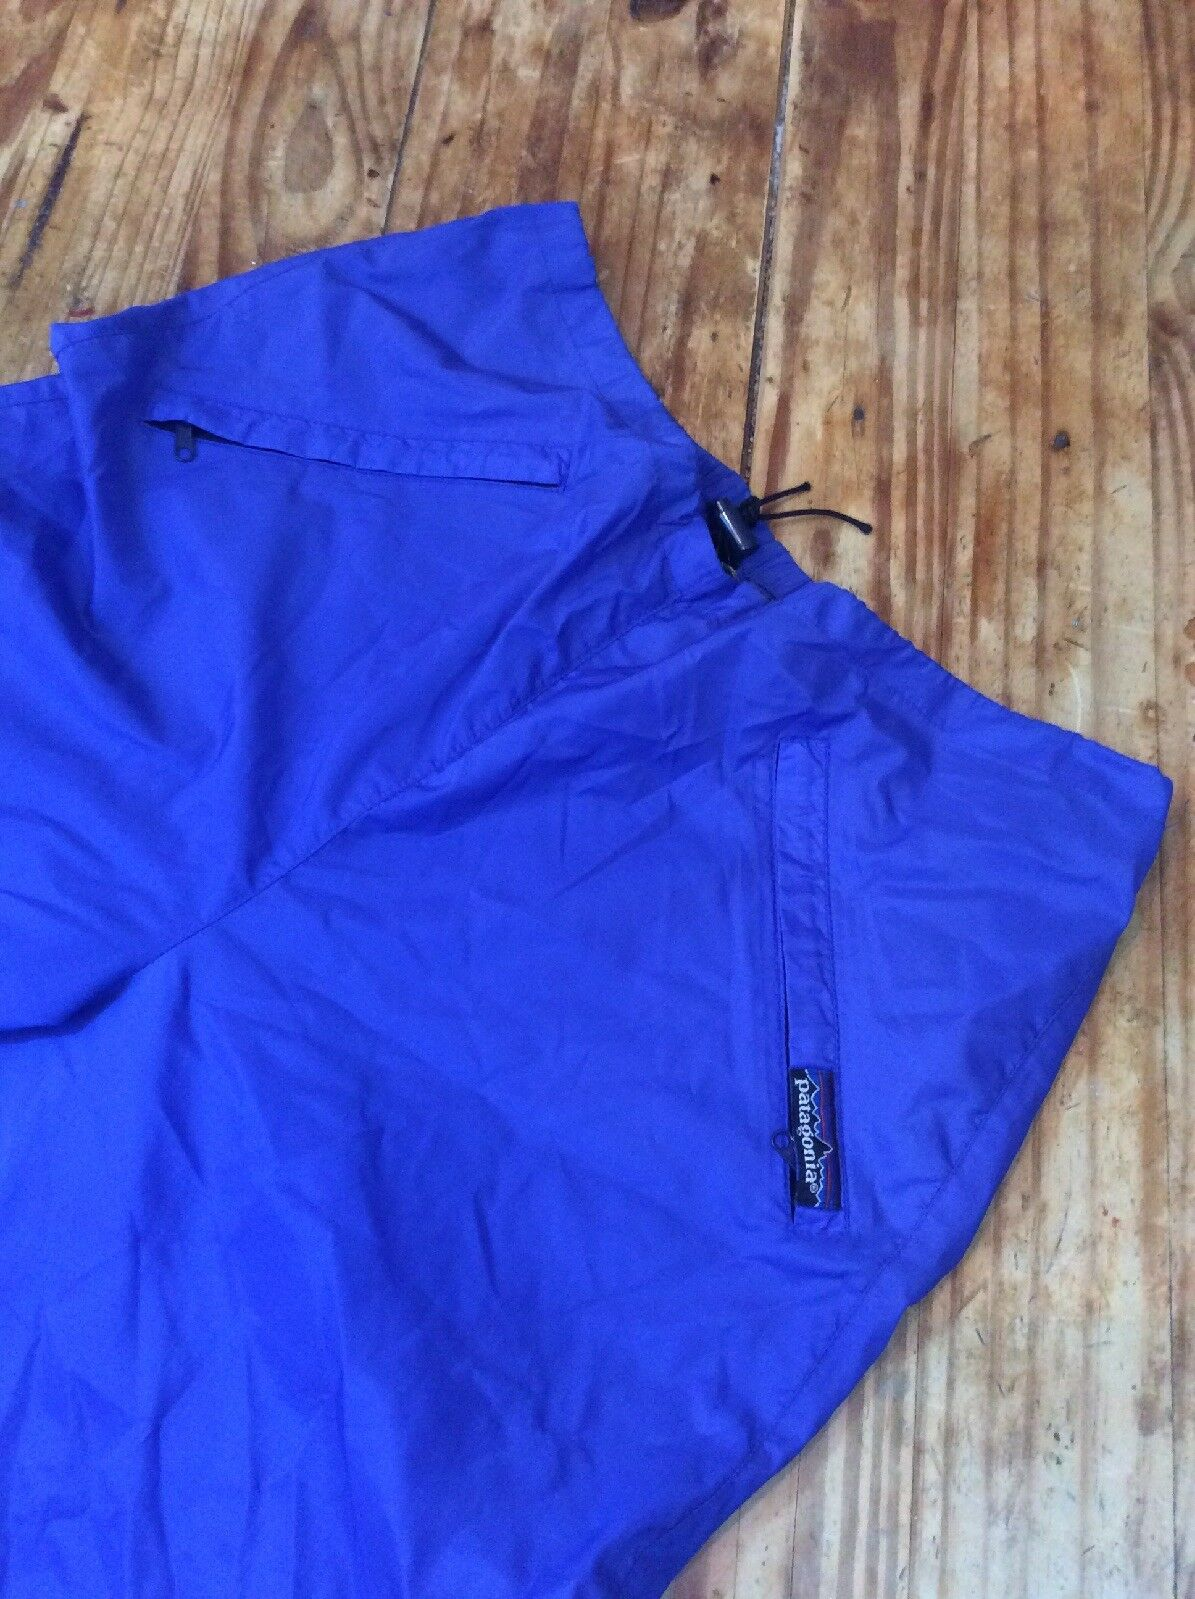 Vintage 80's PATAGONIA Mens Medium M  Outdoor Water repellant jogger Pants bluee